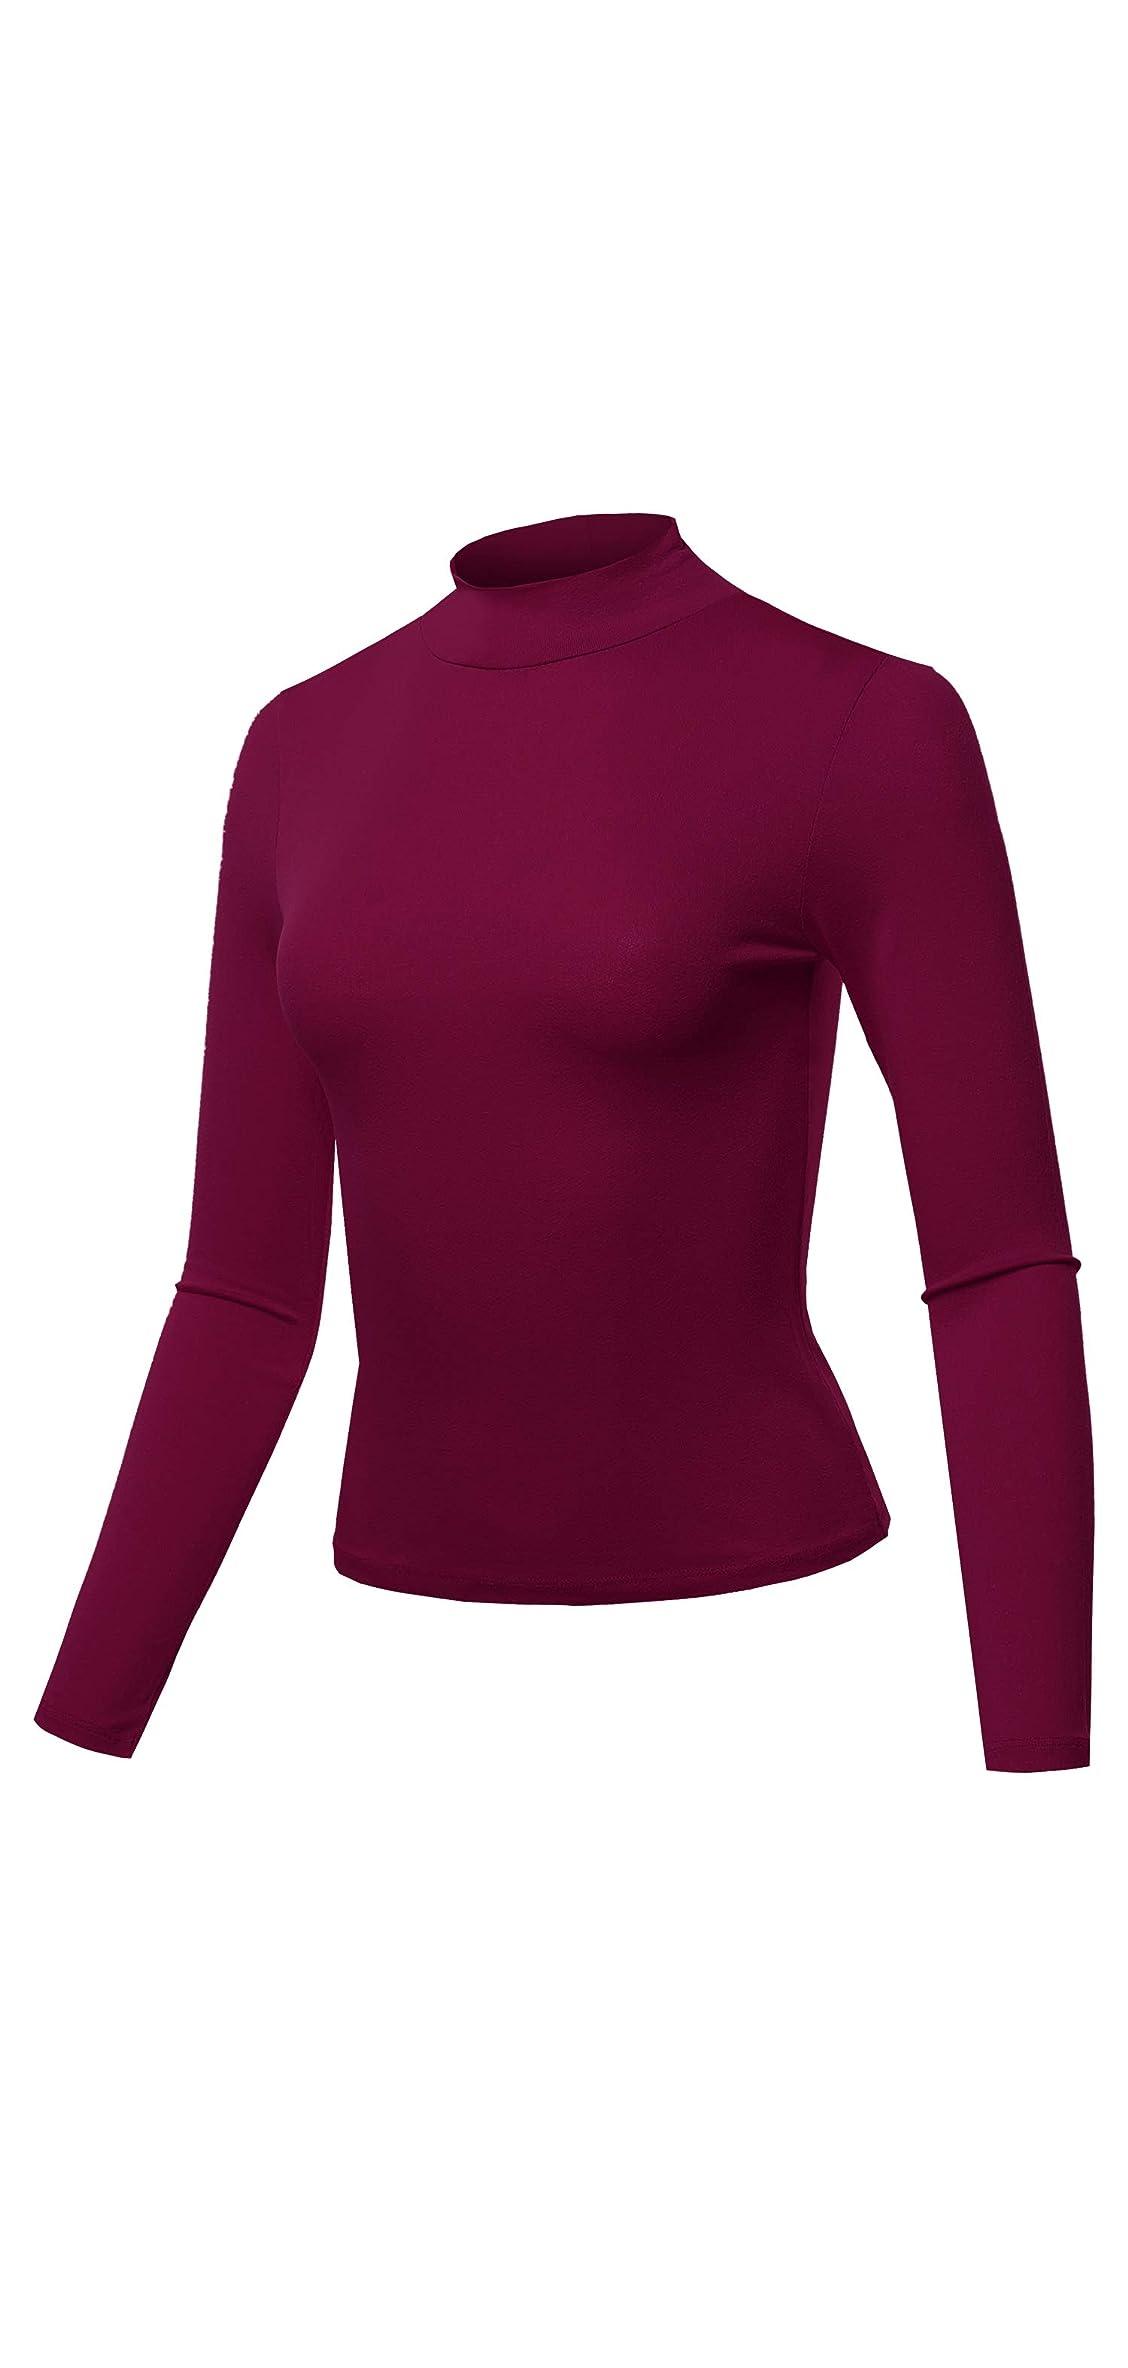 Women's Solid Lightweight Long Sleeve Mock Neck